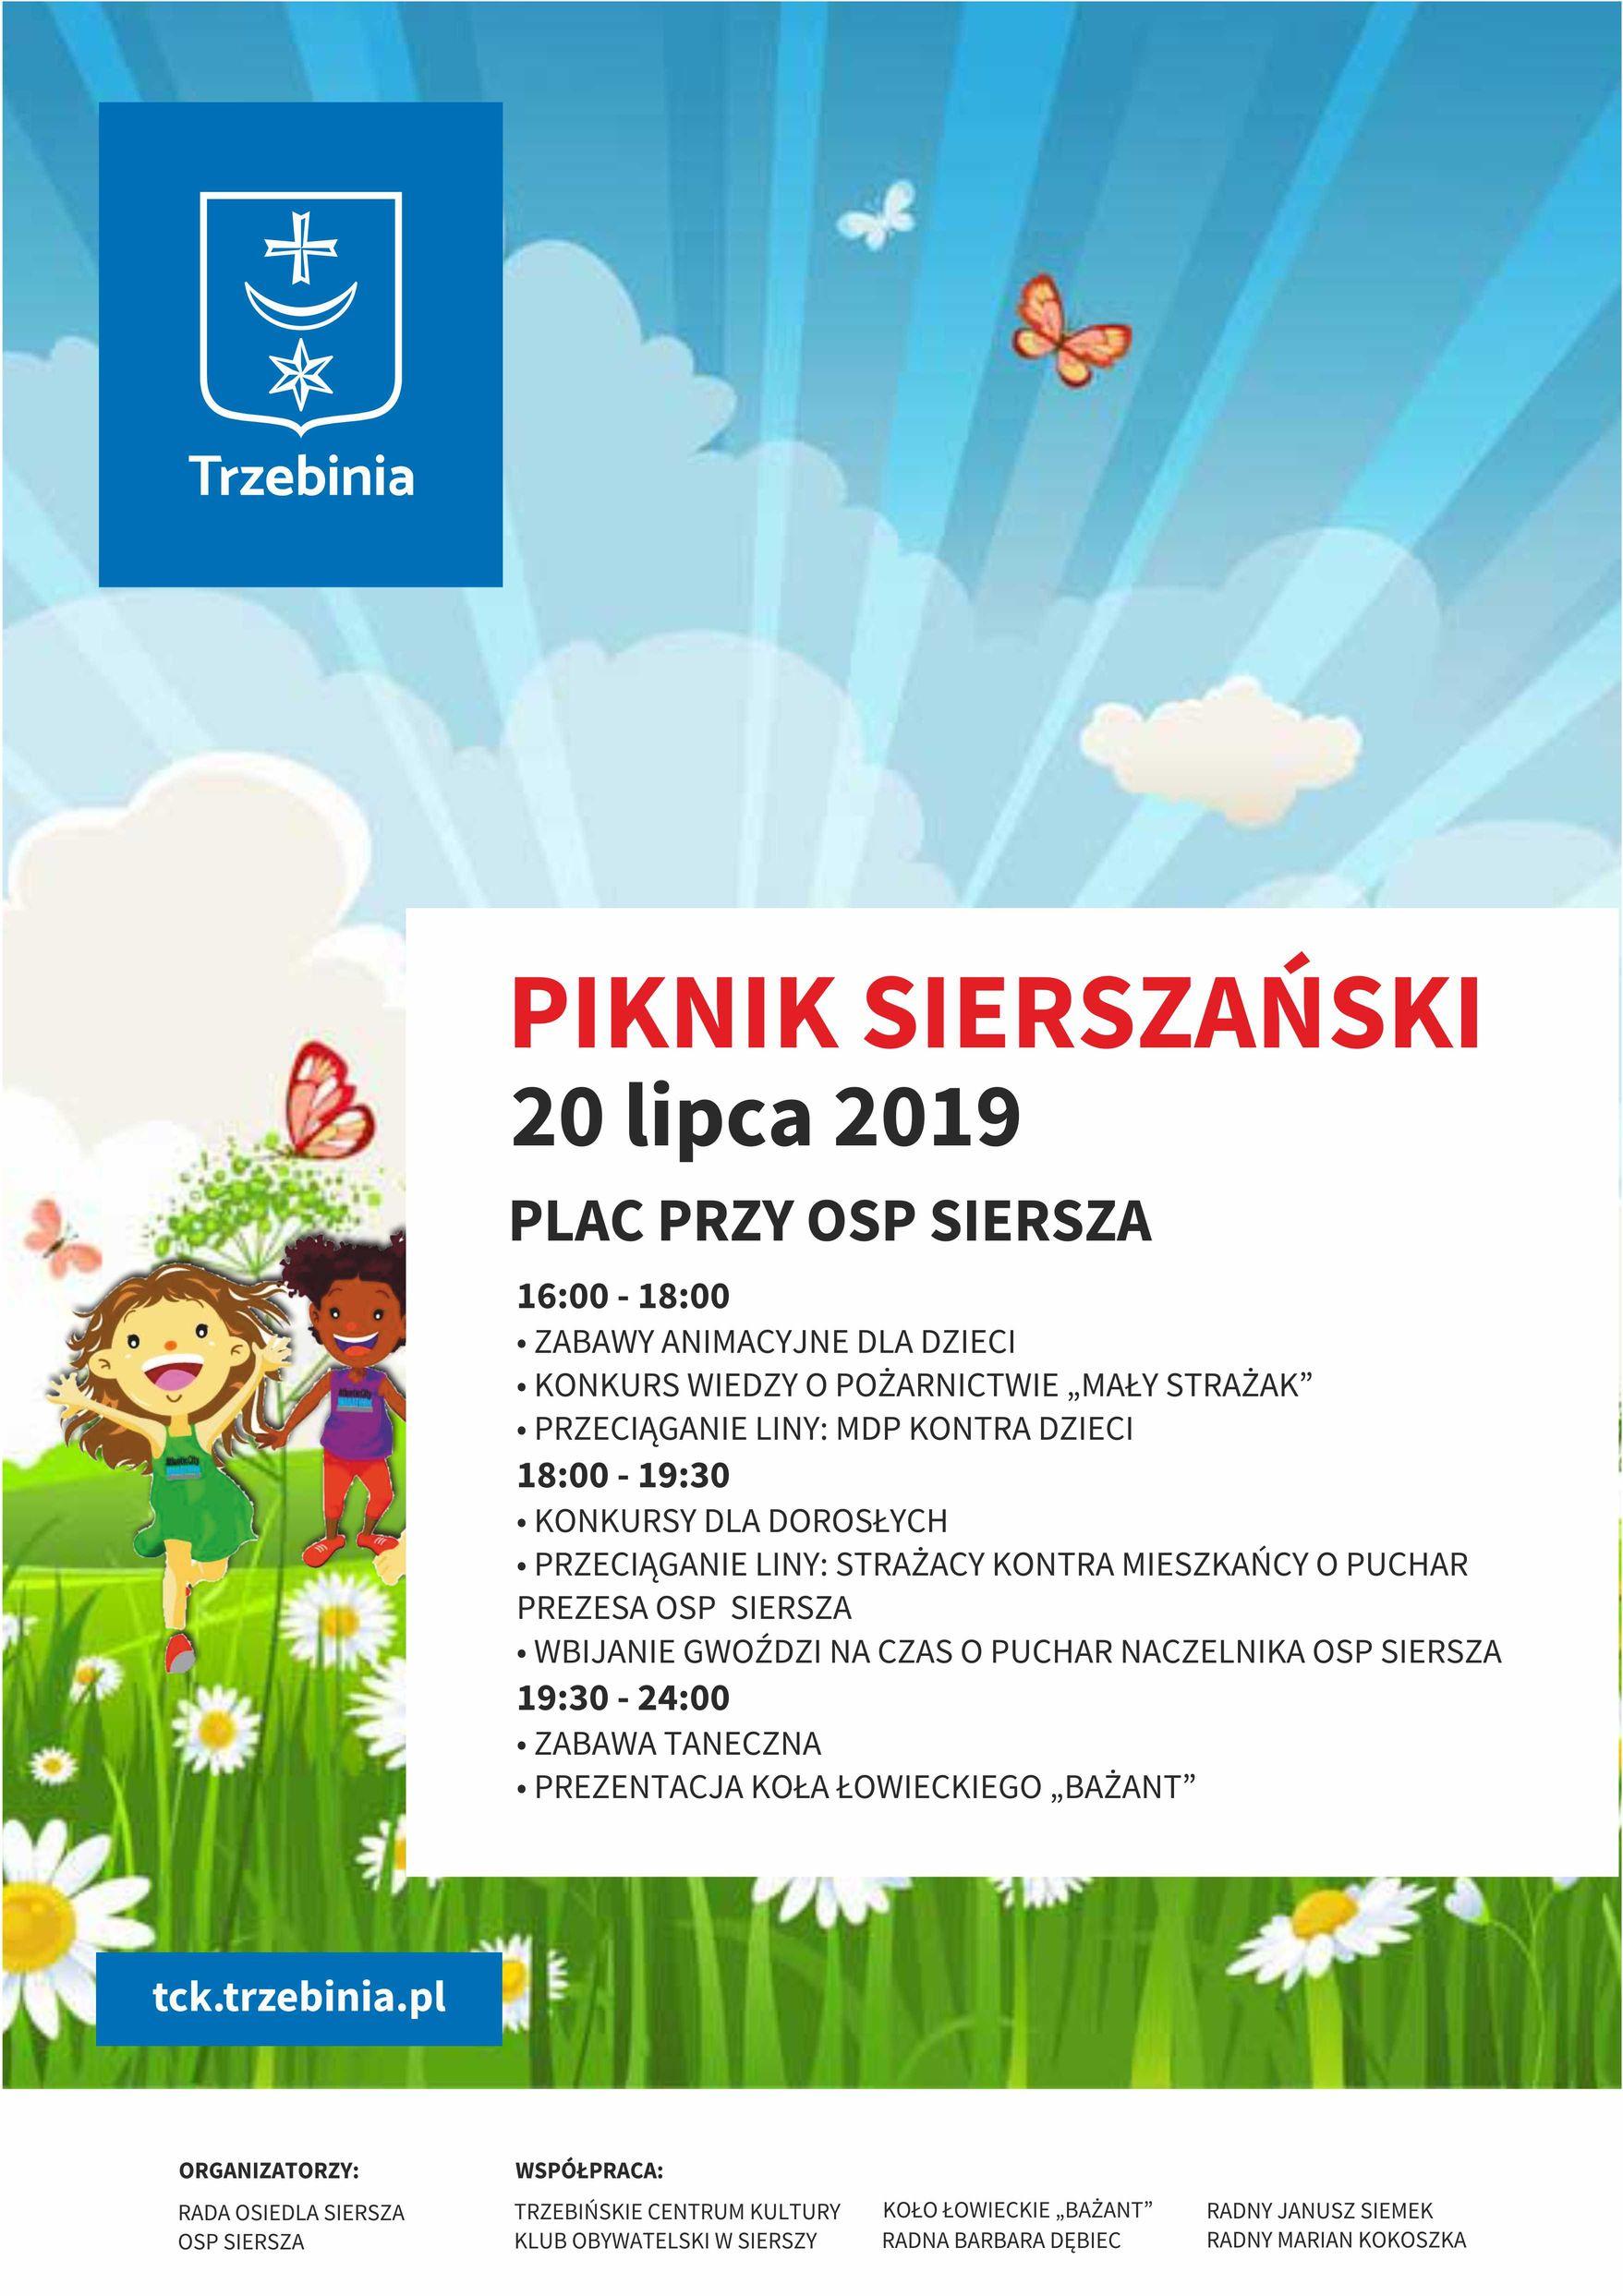 piknik sierszanski 2019 1